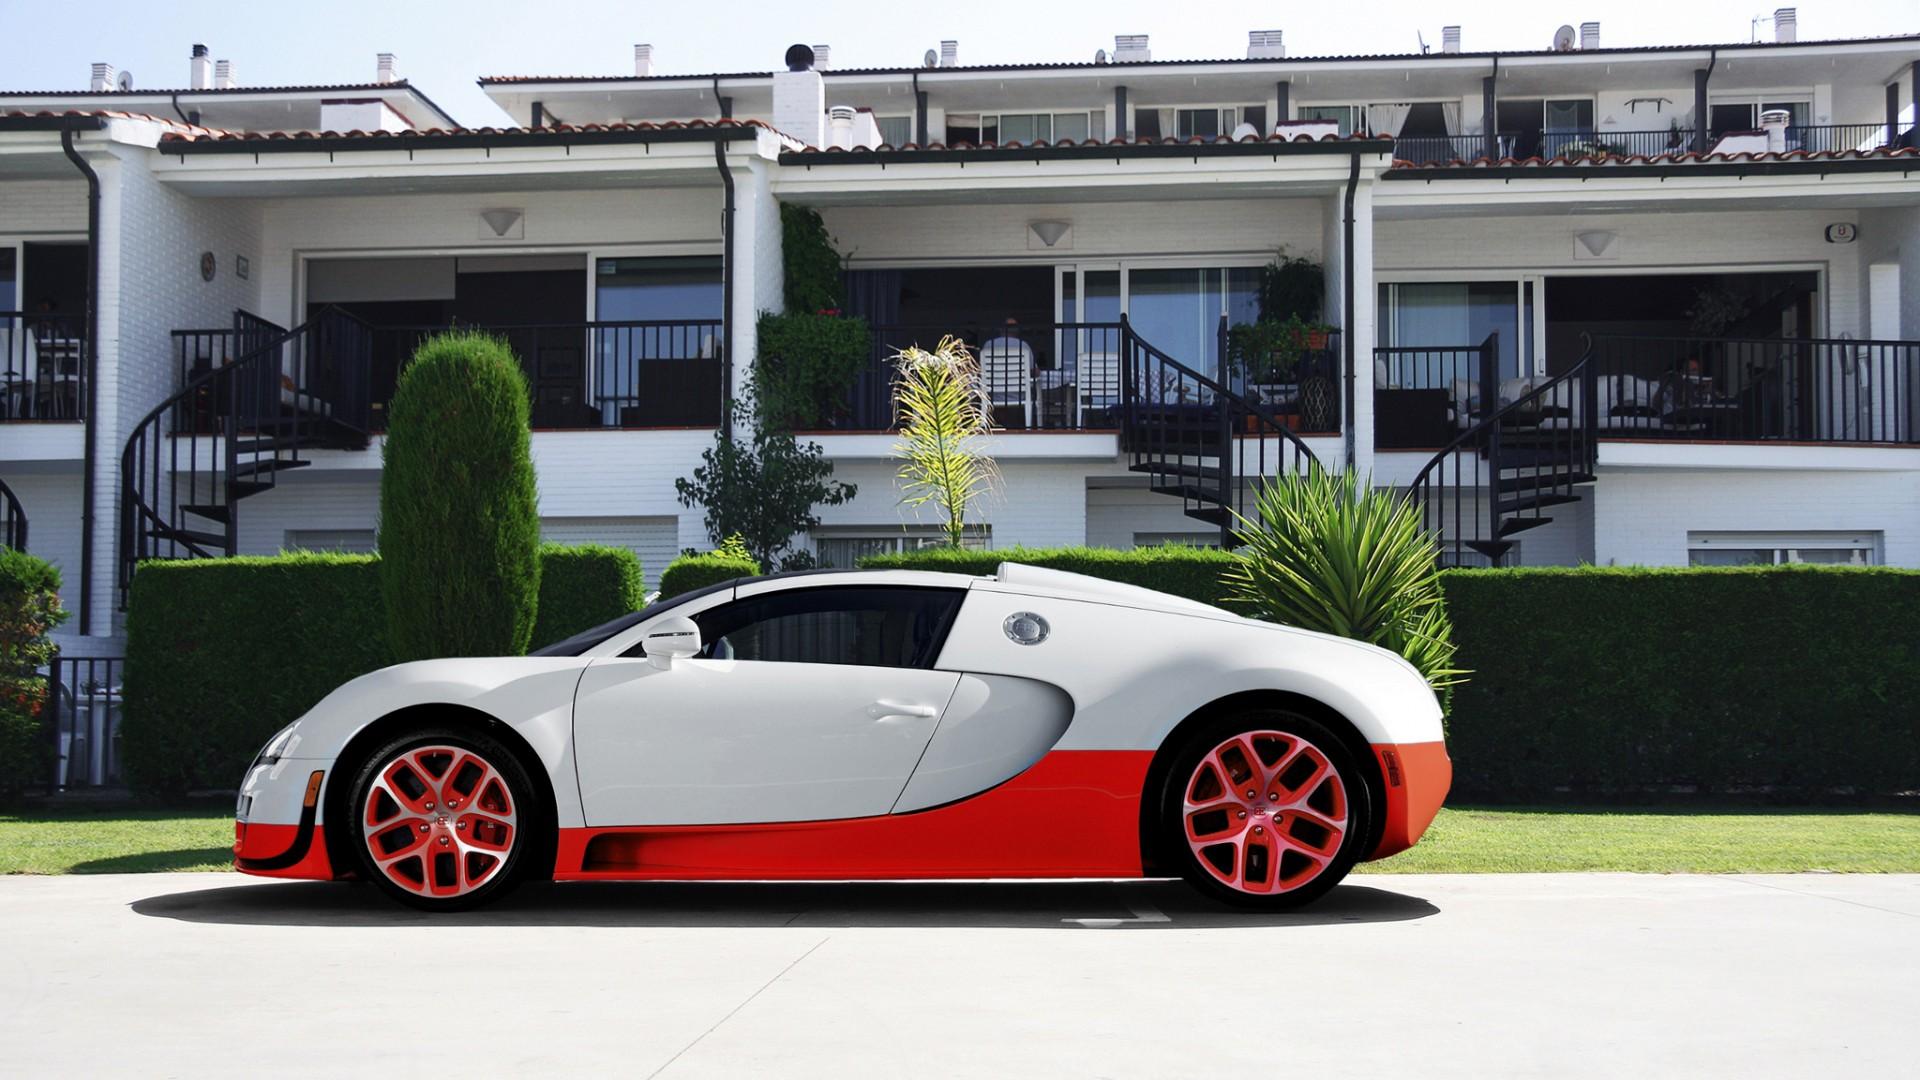 Bugatti-Veyron-Grand-Sport-Vitesse-Blanco-y-Rojo_Fondos-de-Pantalla-de-Carros-Bugatti Remarkable Bugatti Veyron Grand Sport Vitesse Informacion Cars Trend